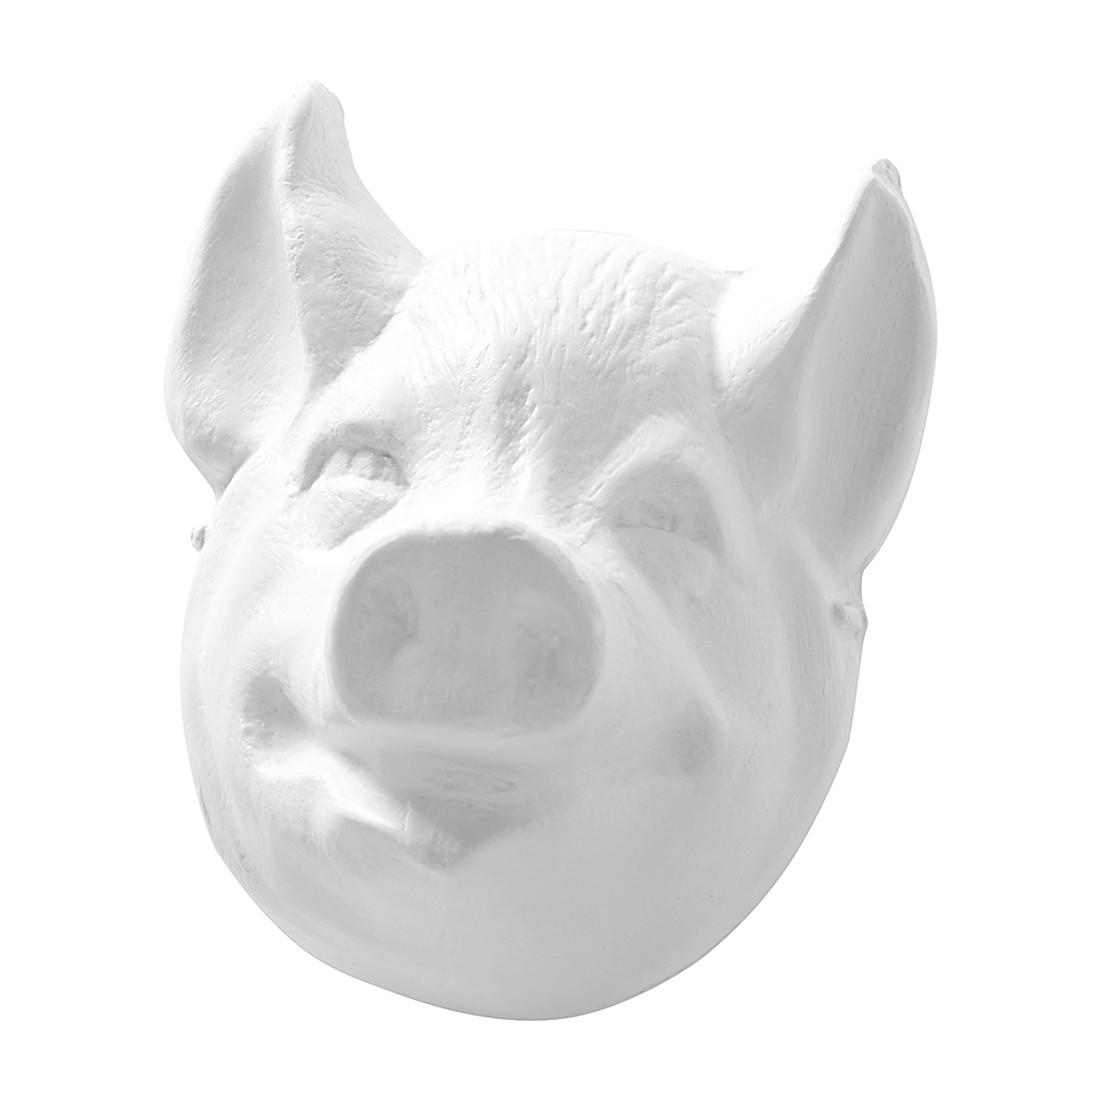 Tierkopf Schwein – Porzellan, Serax online bestellen